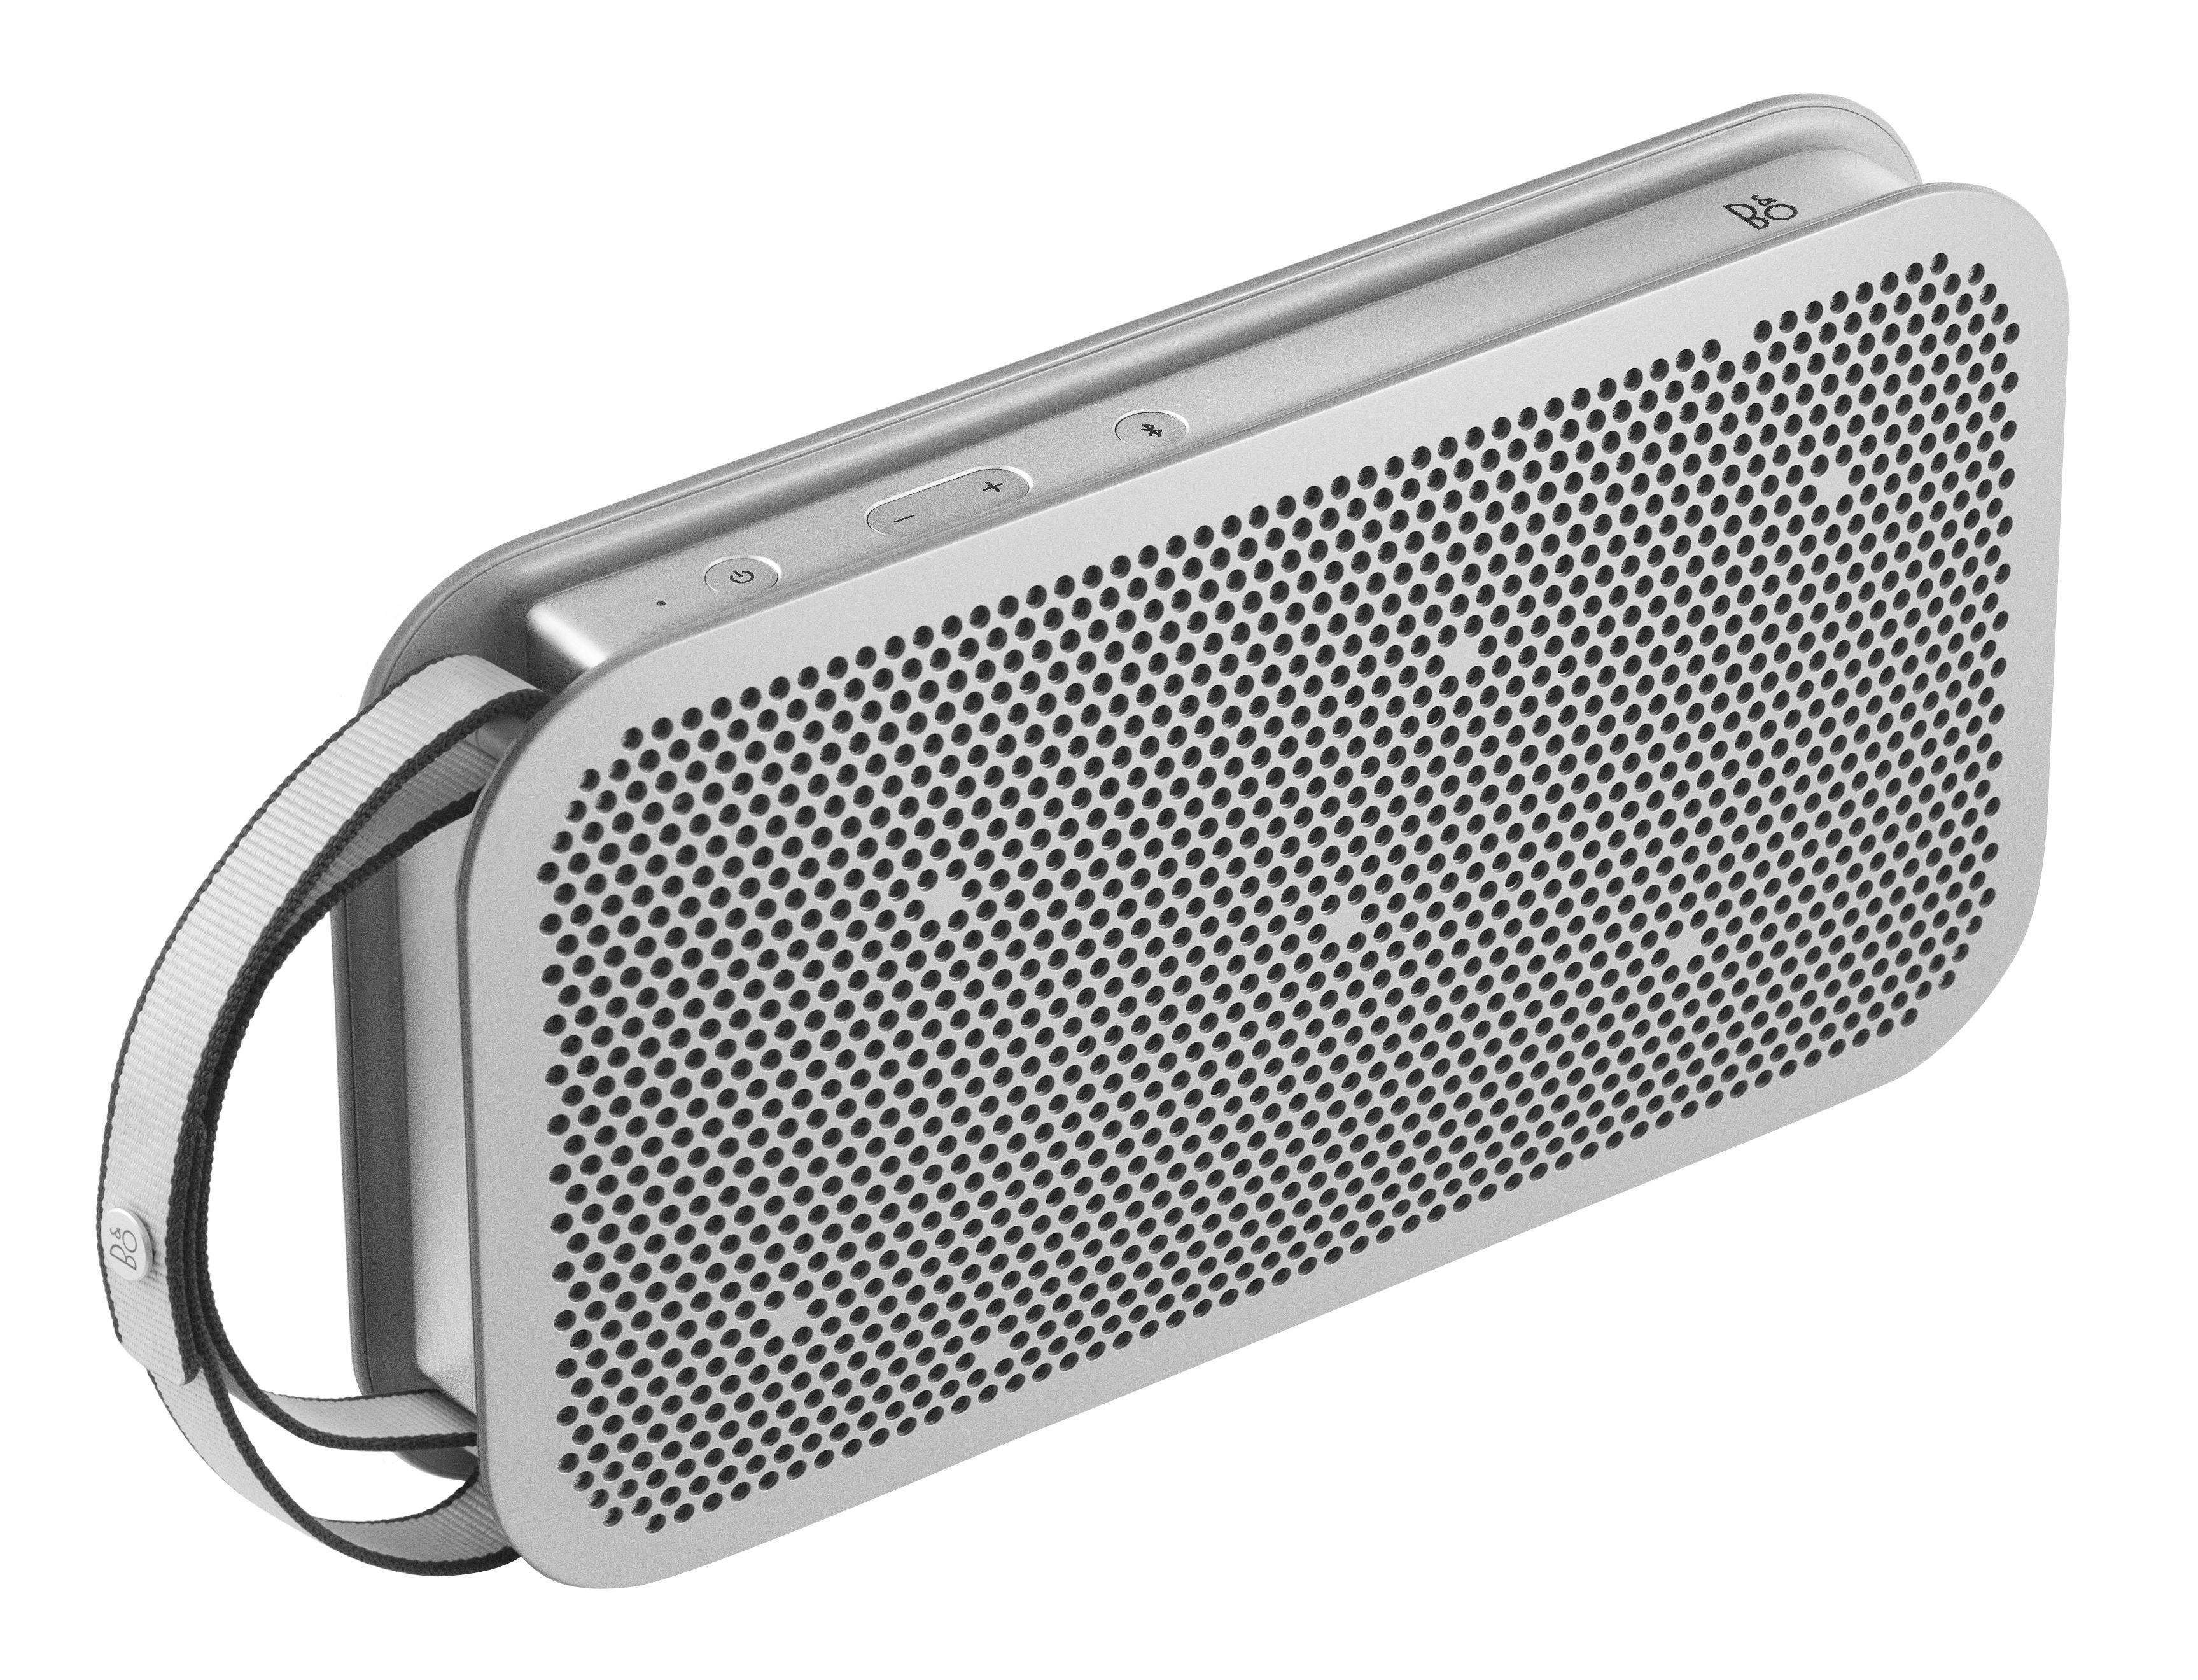 Accessoires - Enceintes audio & son - Enceinte Bluetooth BeoPlay A2 Active / Sans fil - B&O PLAY by Bang & Olufsen - Acier - Aluminium, Tissu